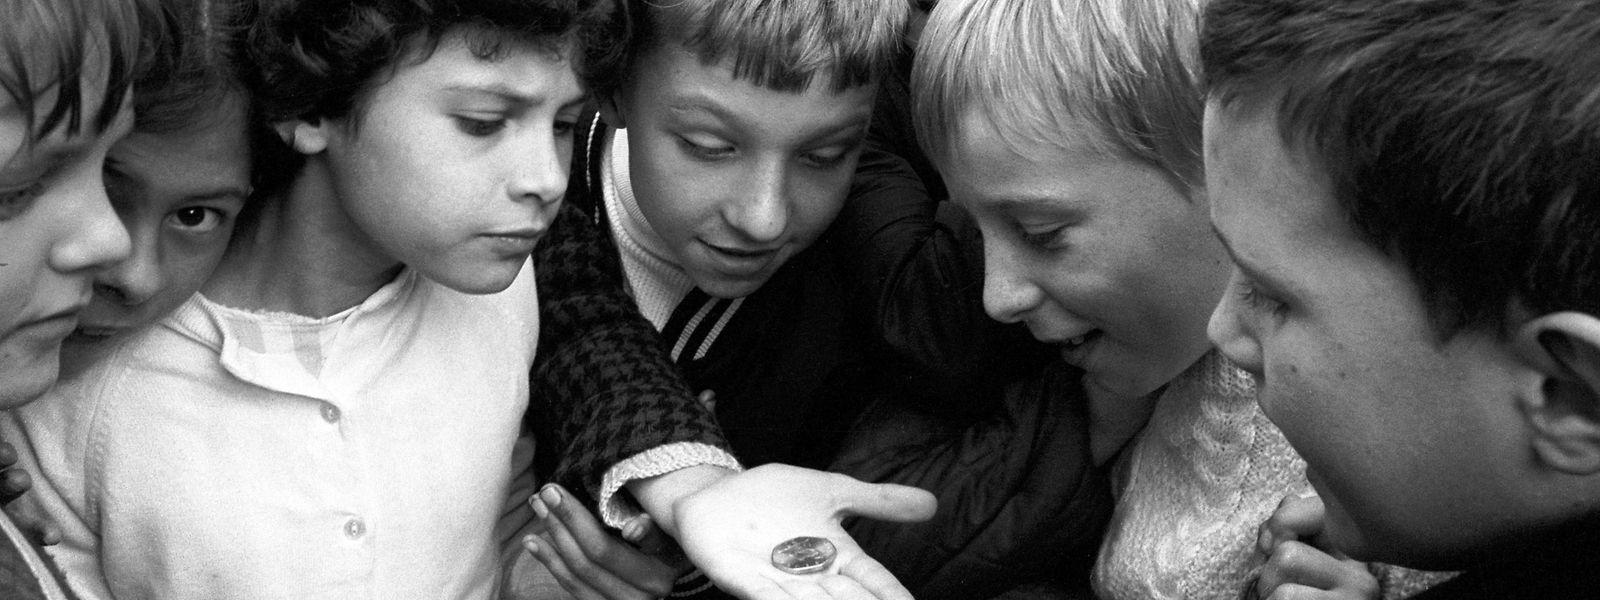 Kinder betrachten am Trafalgar Square in London die neue dezimale 50-Pence-Münze.